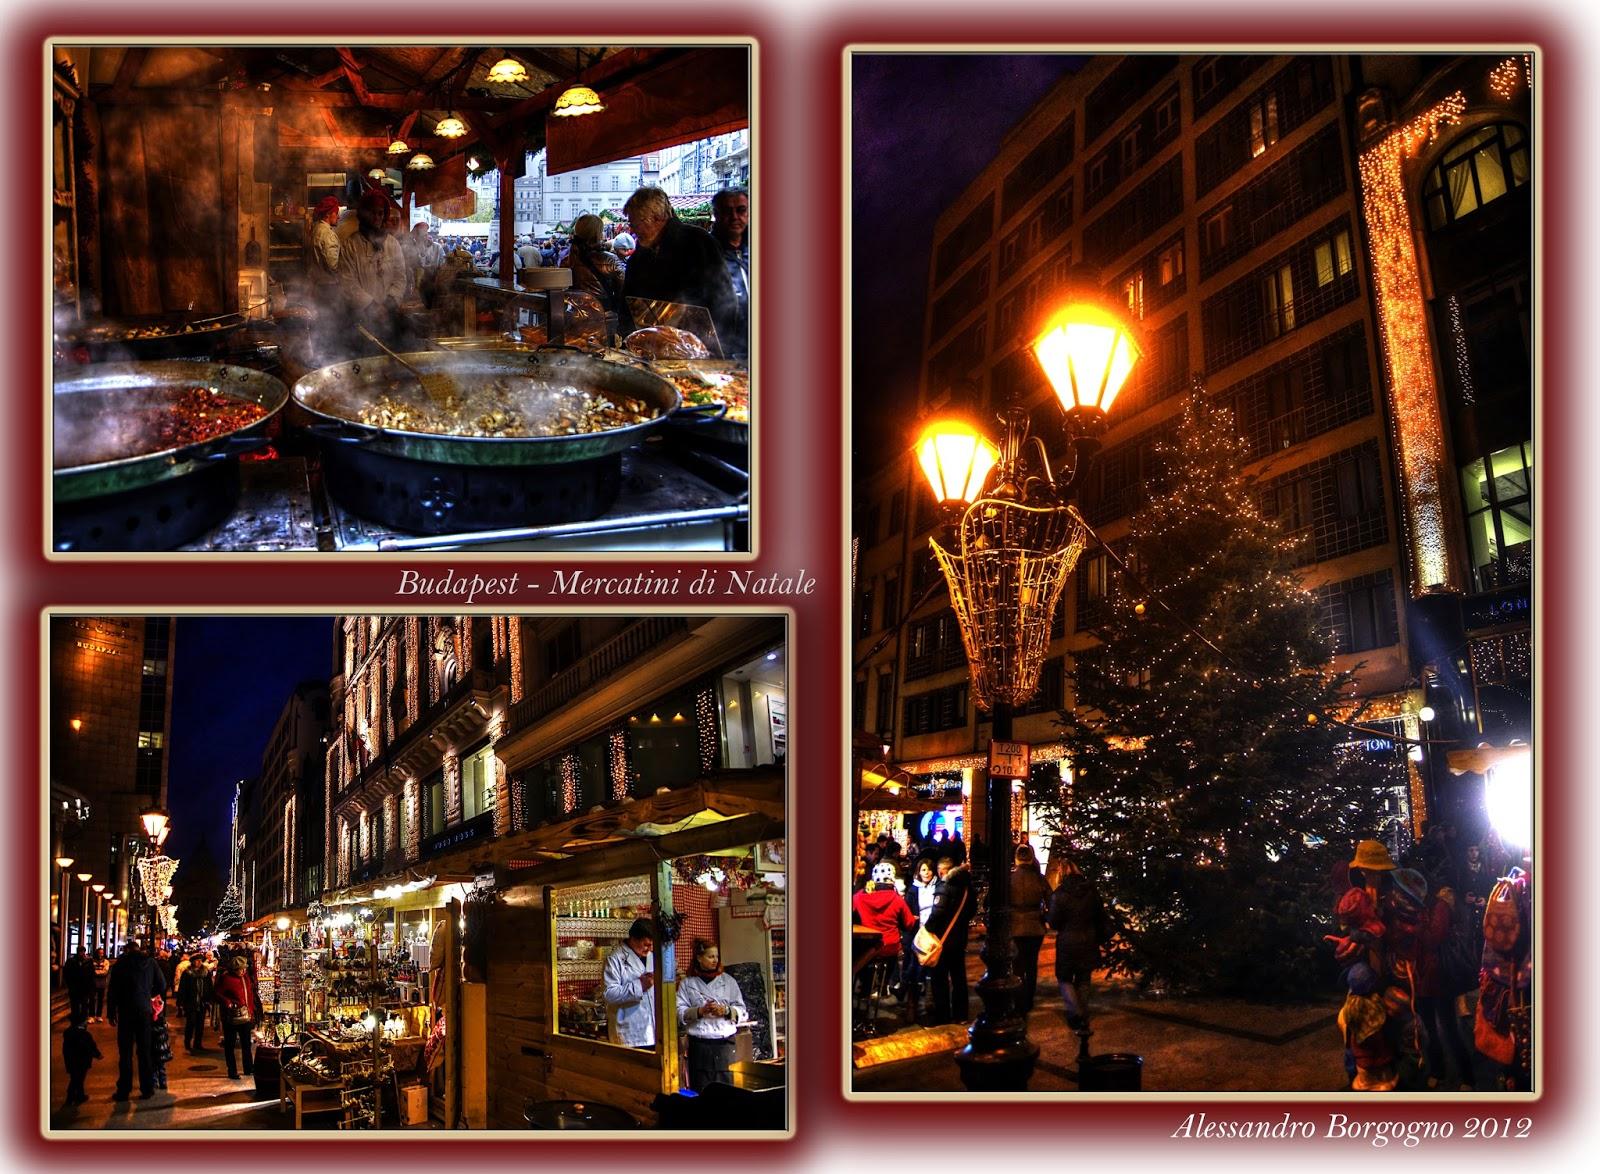 Budapest - Mercatini di Natale